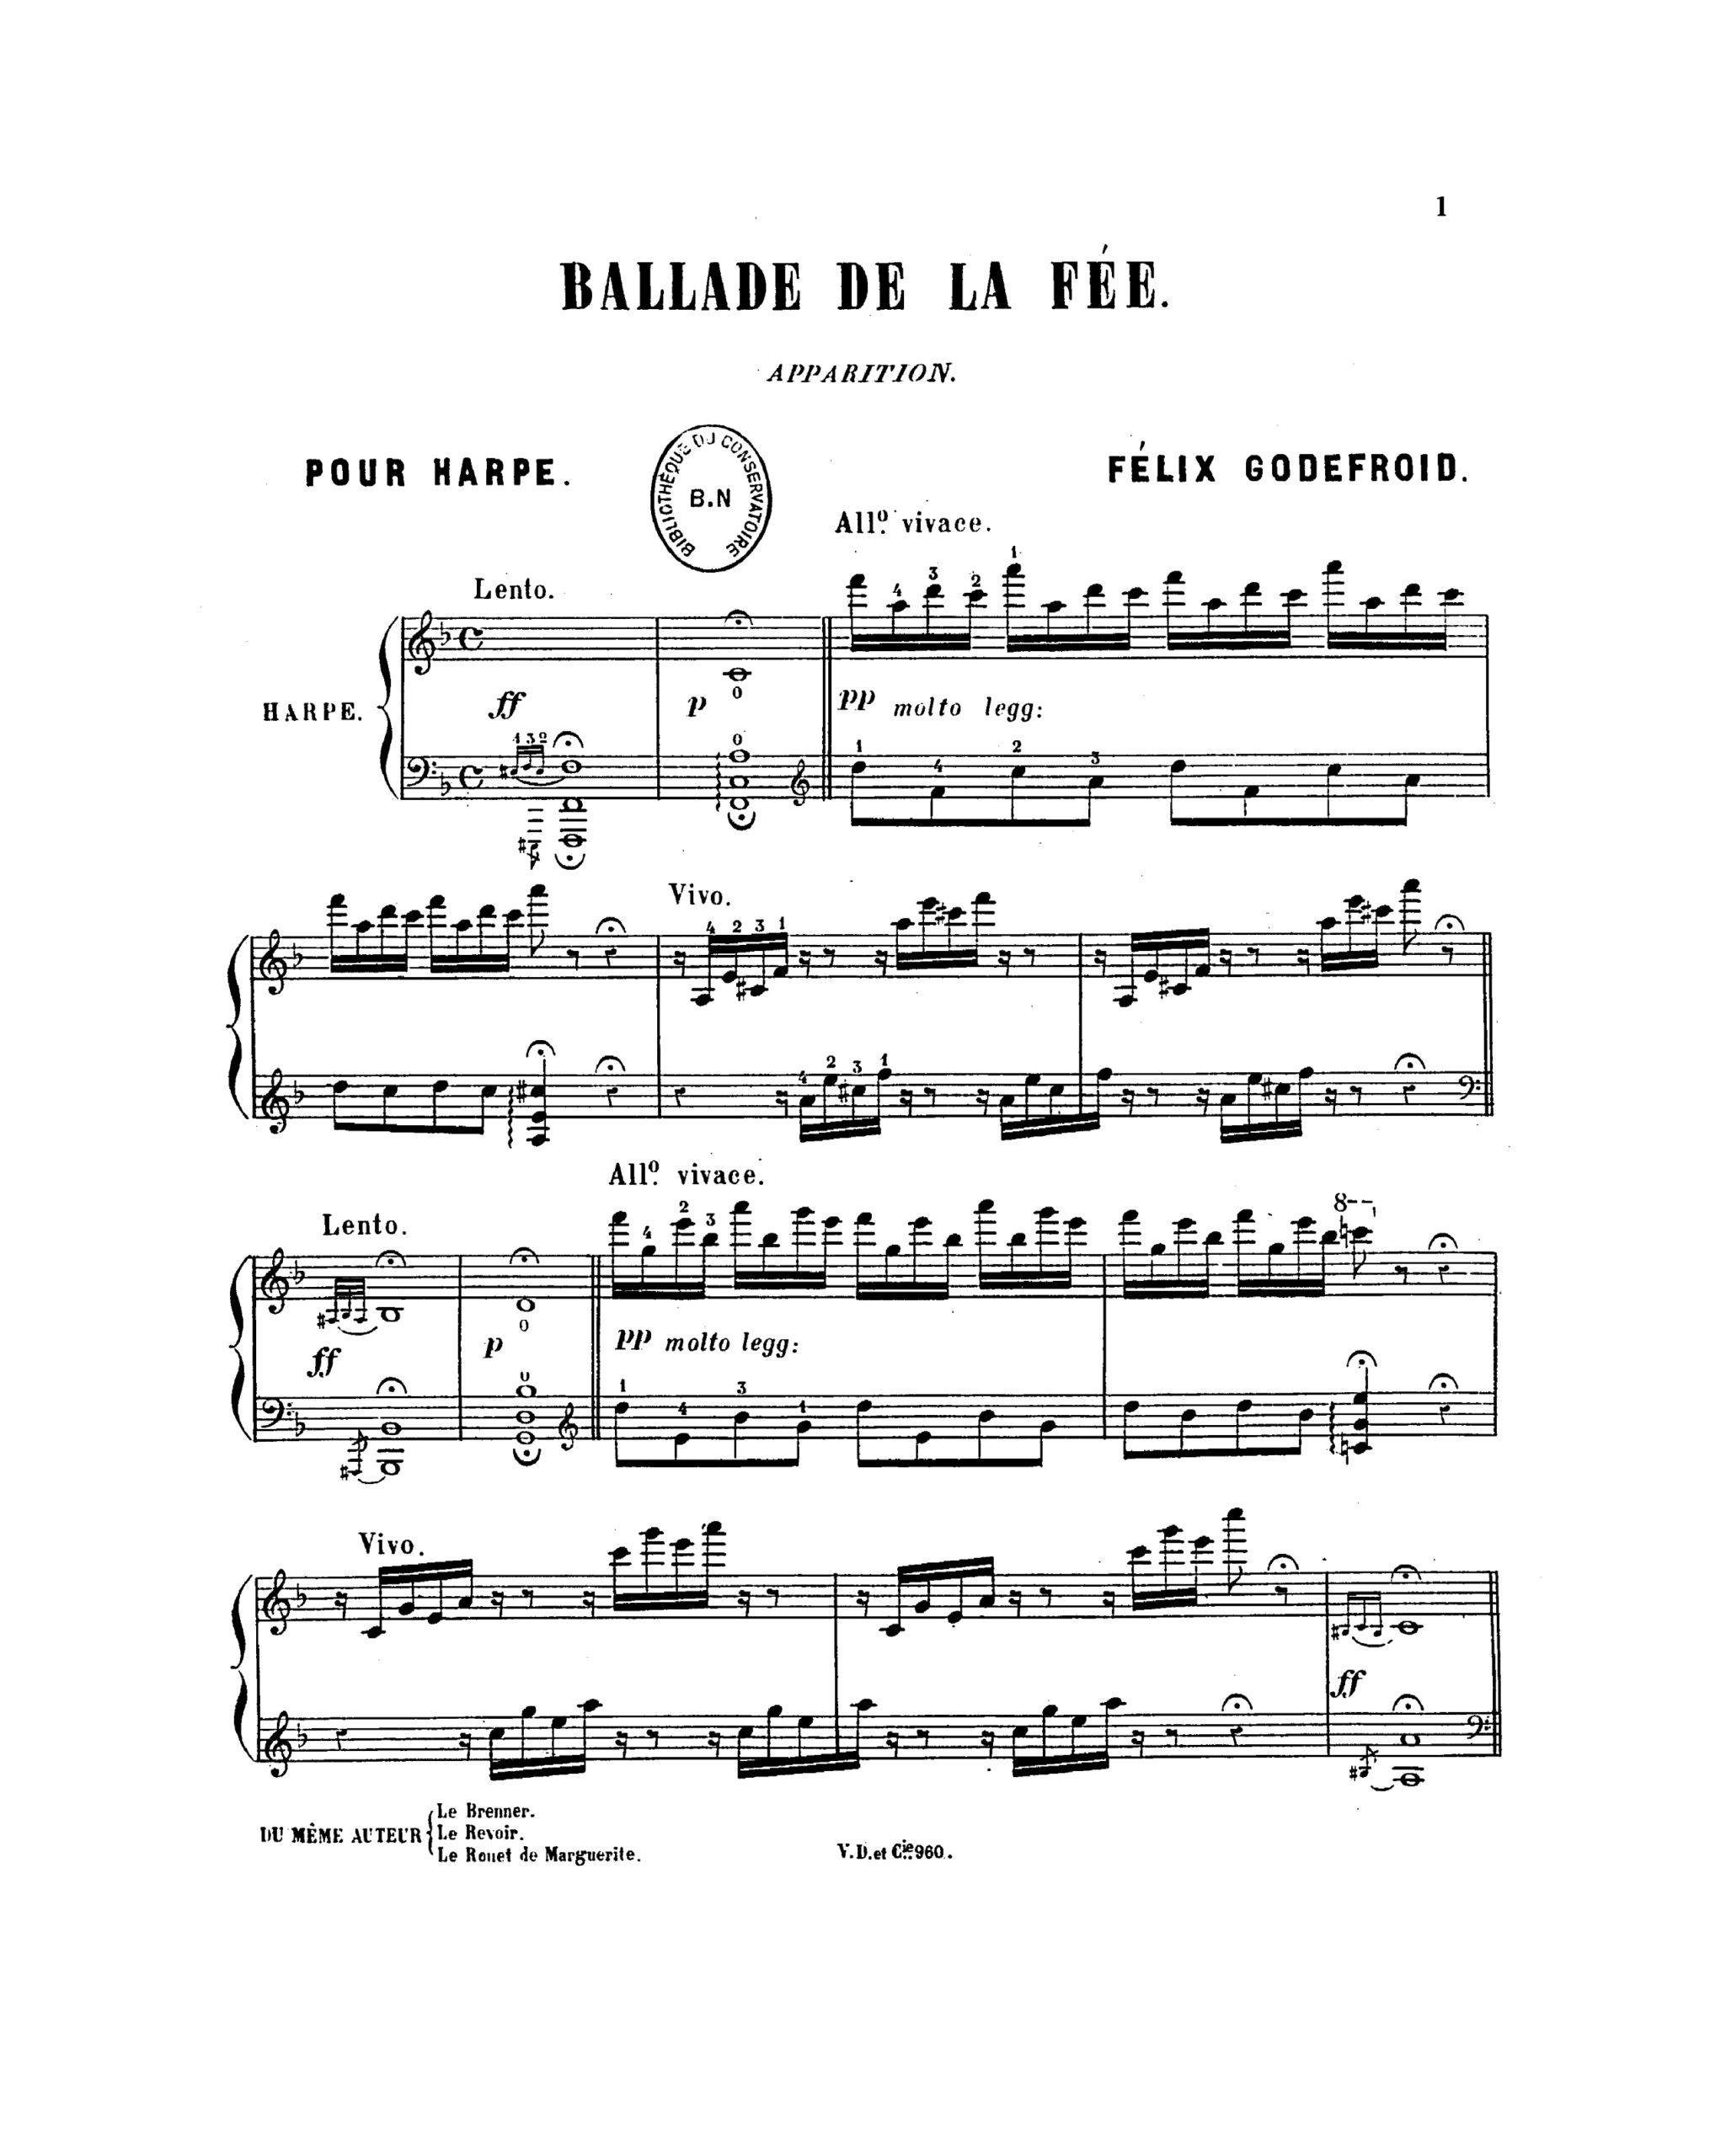 Godefroid-BalladedelaFee_1